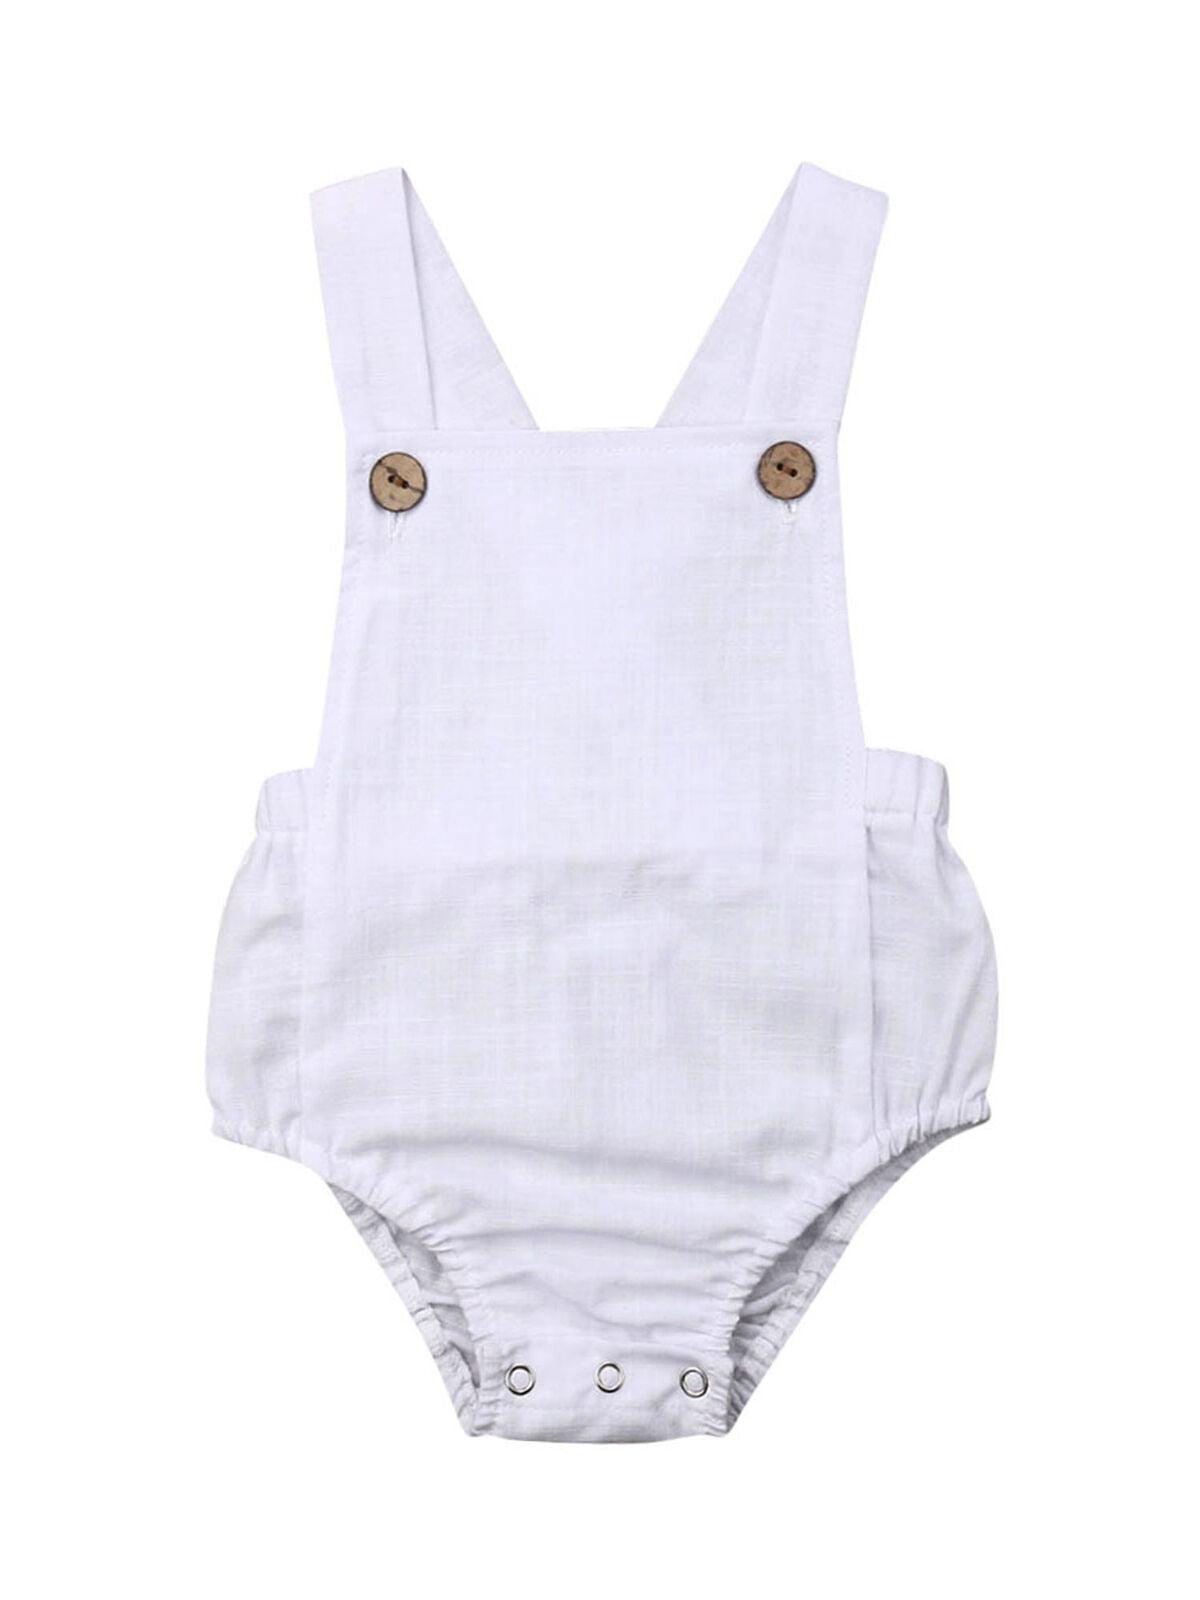 Toddler Newborn Baby Girls Boys Sleeveless Solid Strap Bodysuit Romper Clothes